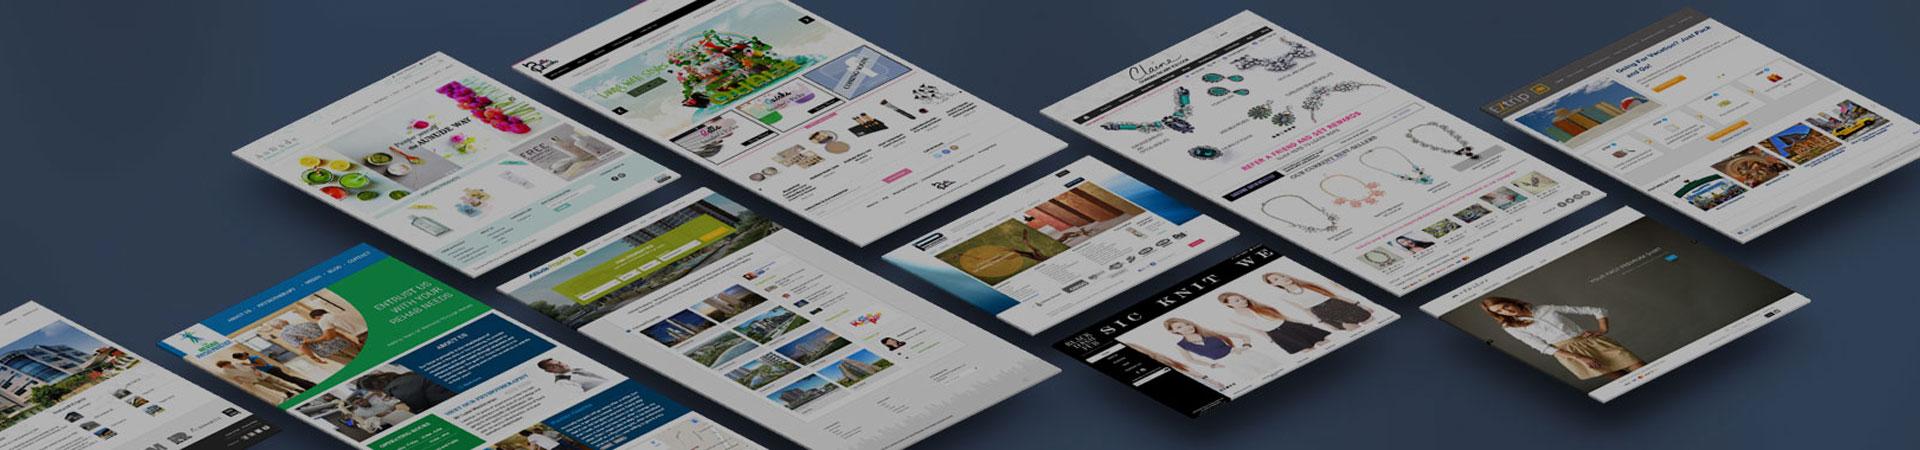 Website Design Singapore - Morrisre